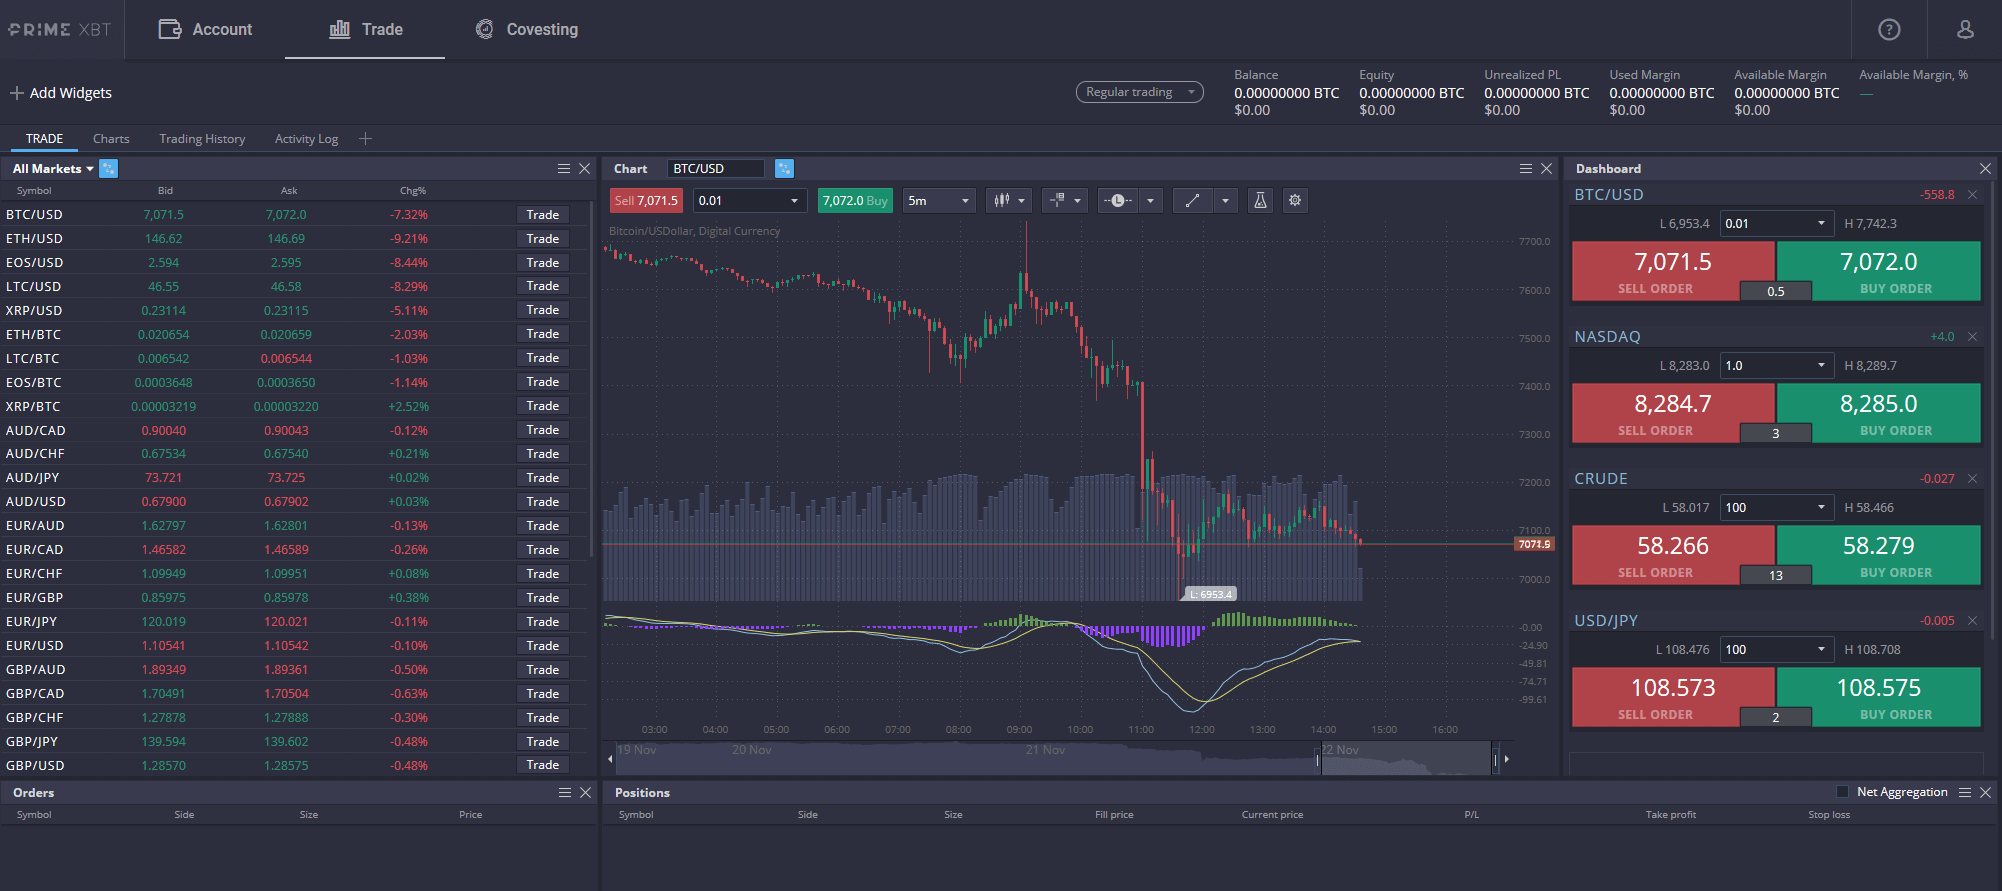 PrimeXBT Trading Platform